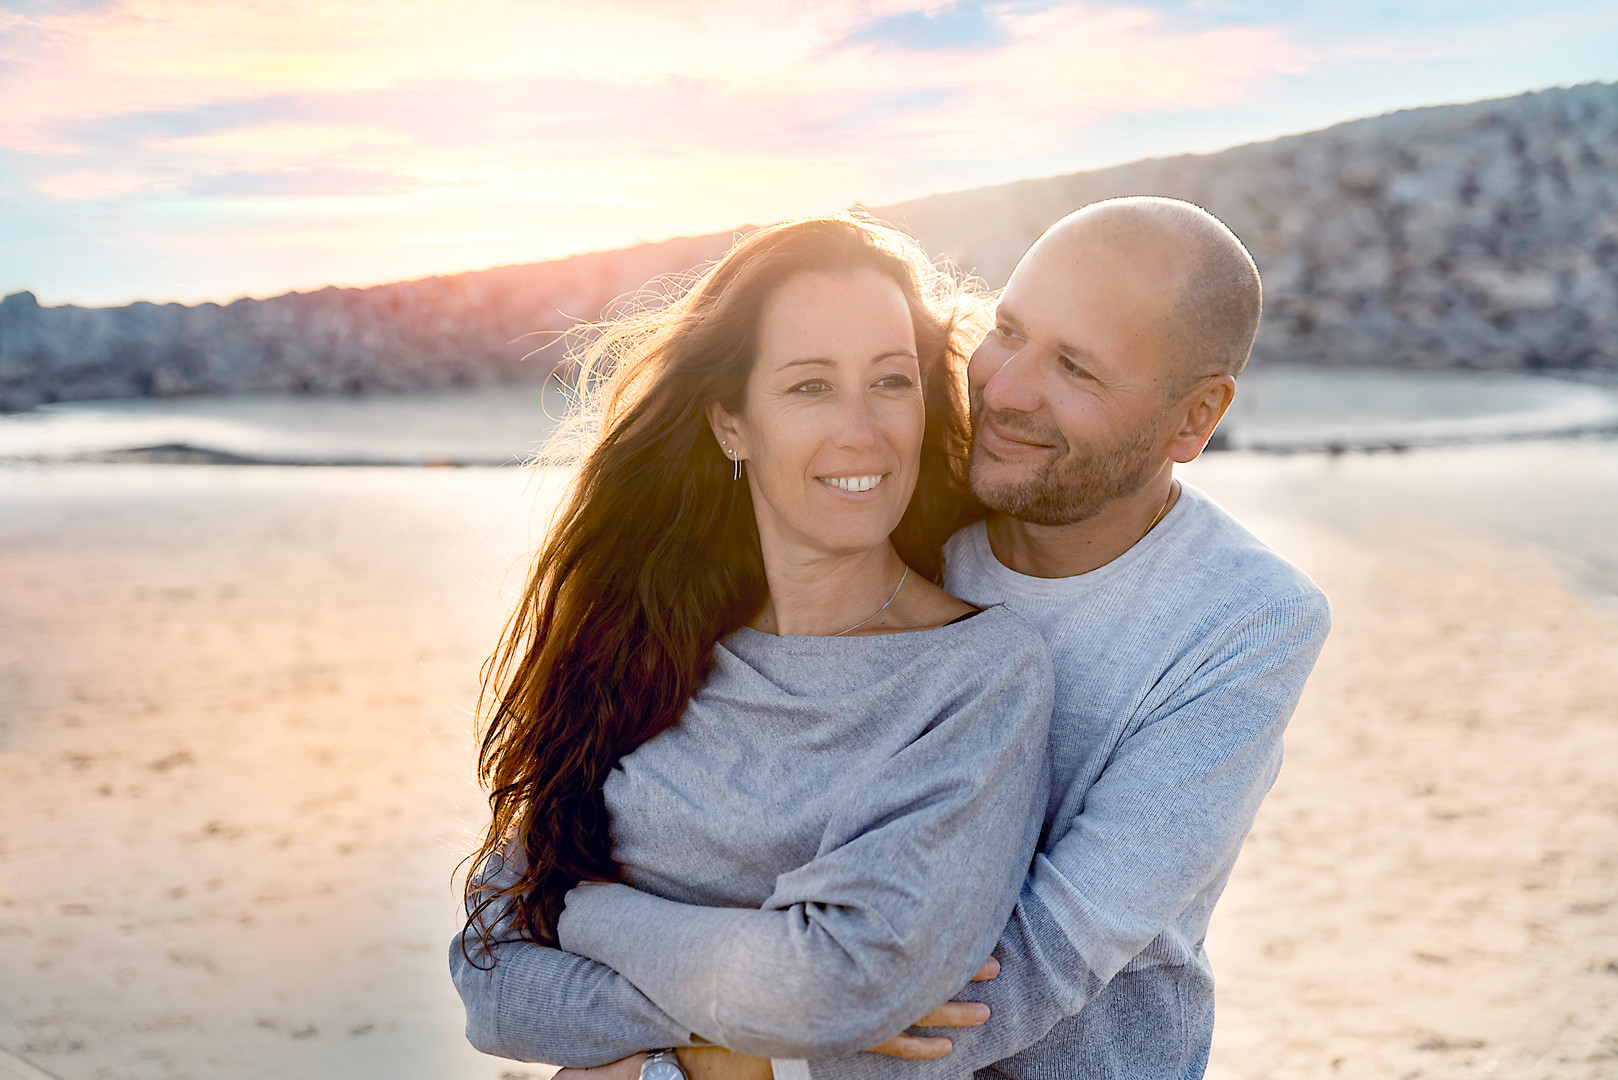 Couple - Photographe famille Montpellier - Virginie Peigne